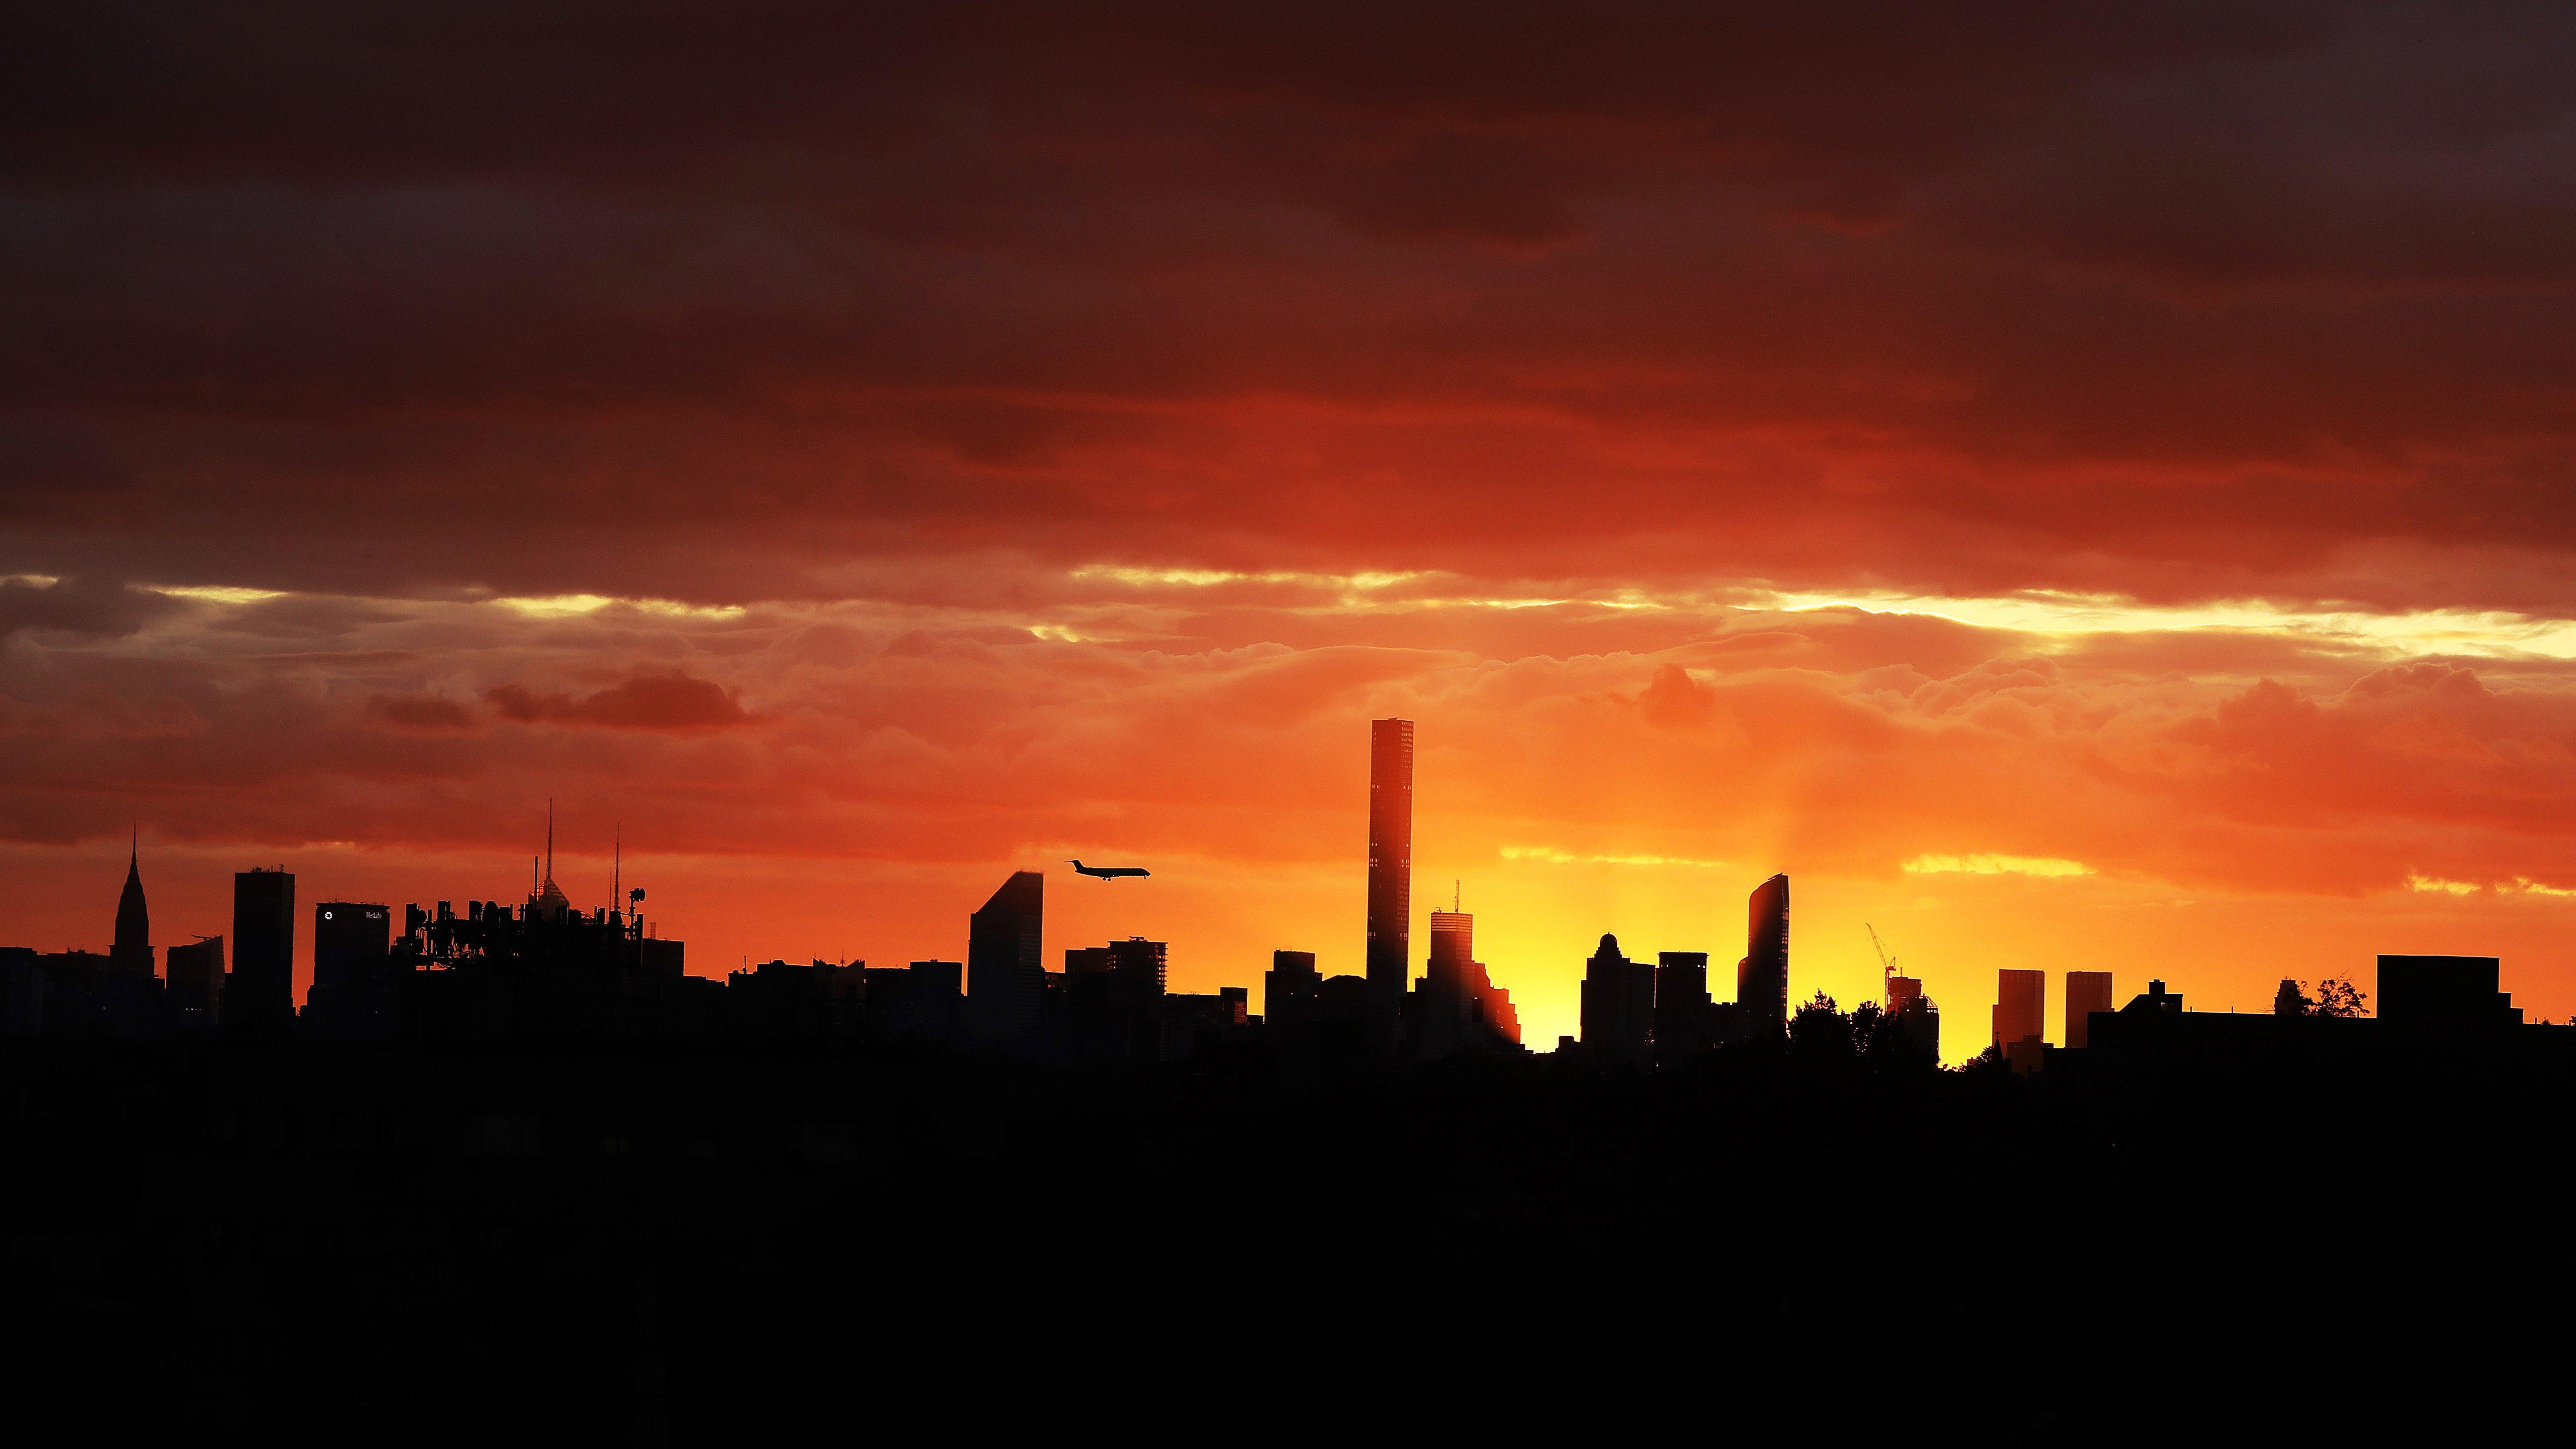 A plane flies near the Manhattan skyline at sunset, as seen from the USTA Billie Jean King National Tennis Center during the U.S. Open tennis tournament, Tuesday, Sept. 6, 2016, in New York. (AP Photo/Darron Cummings)